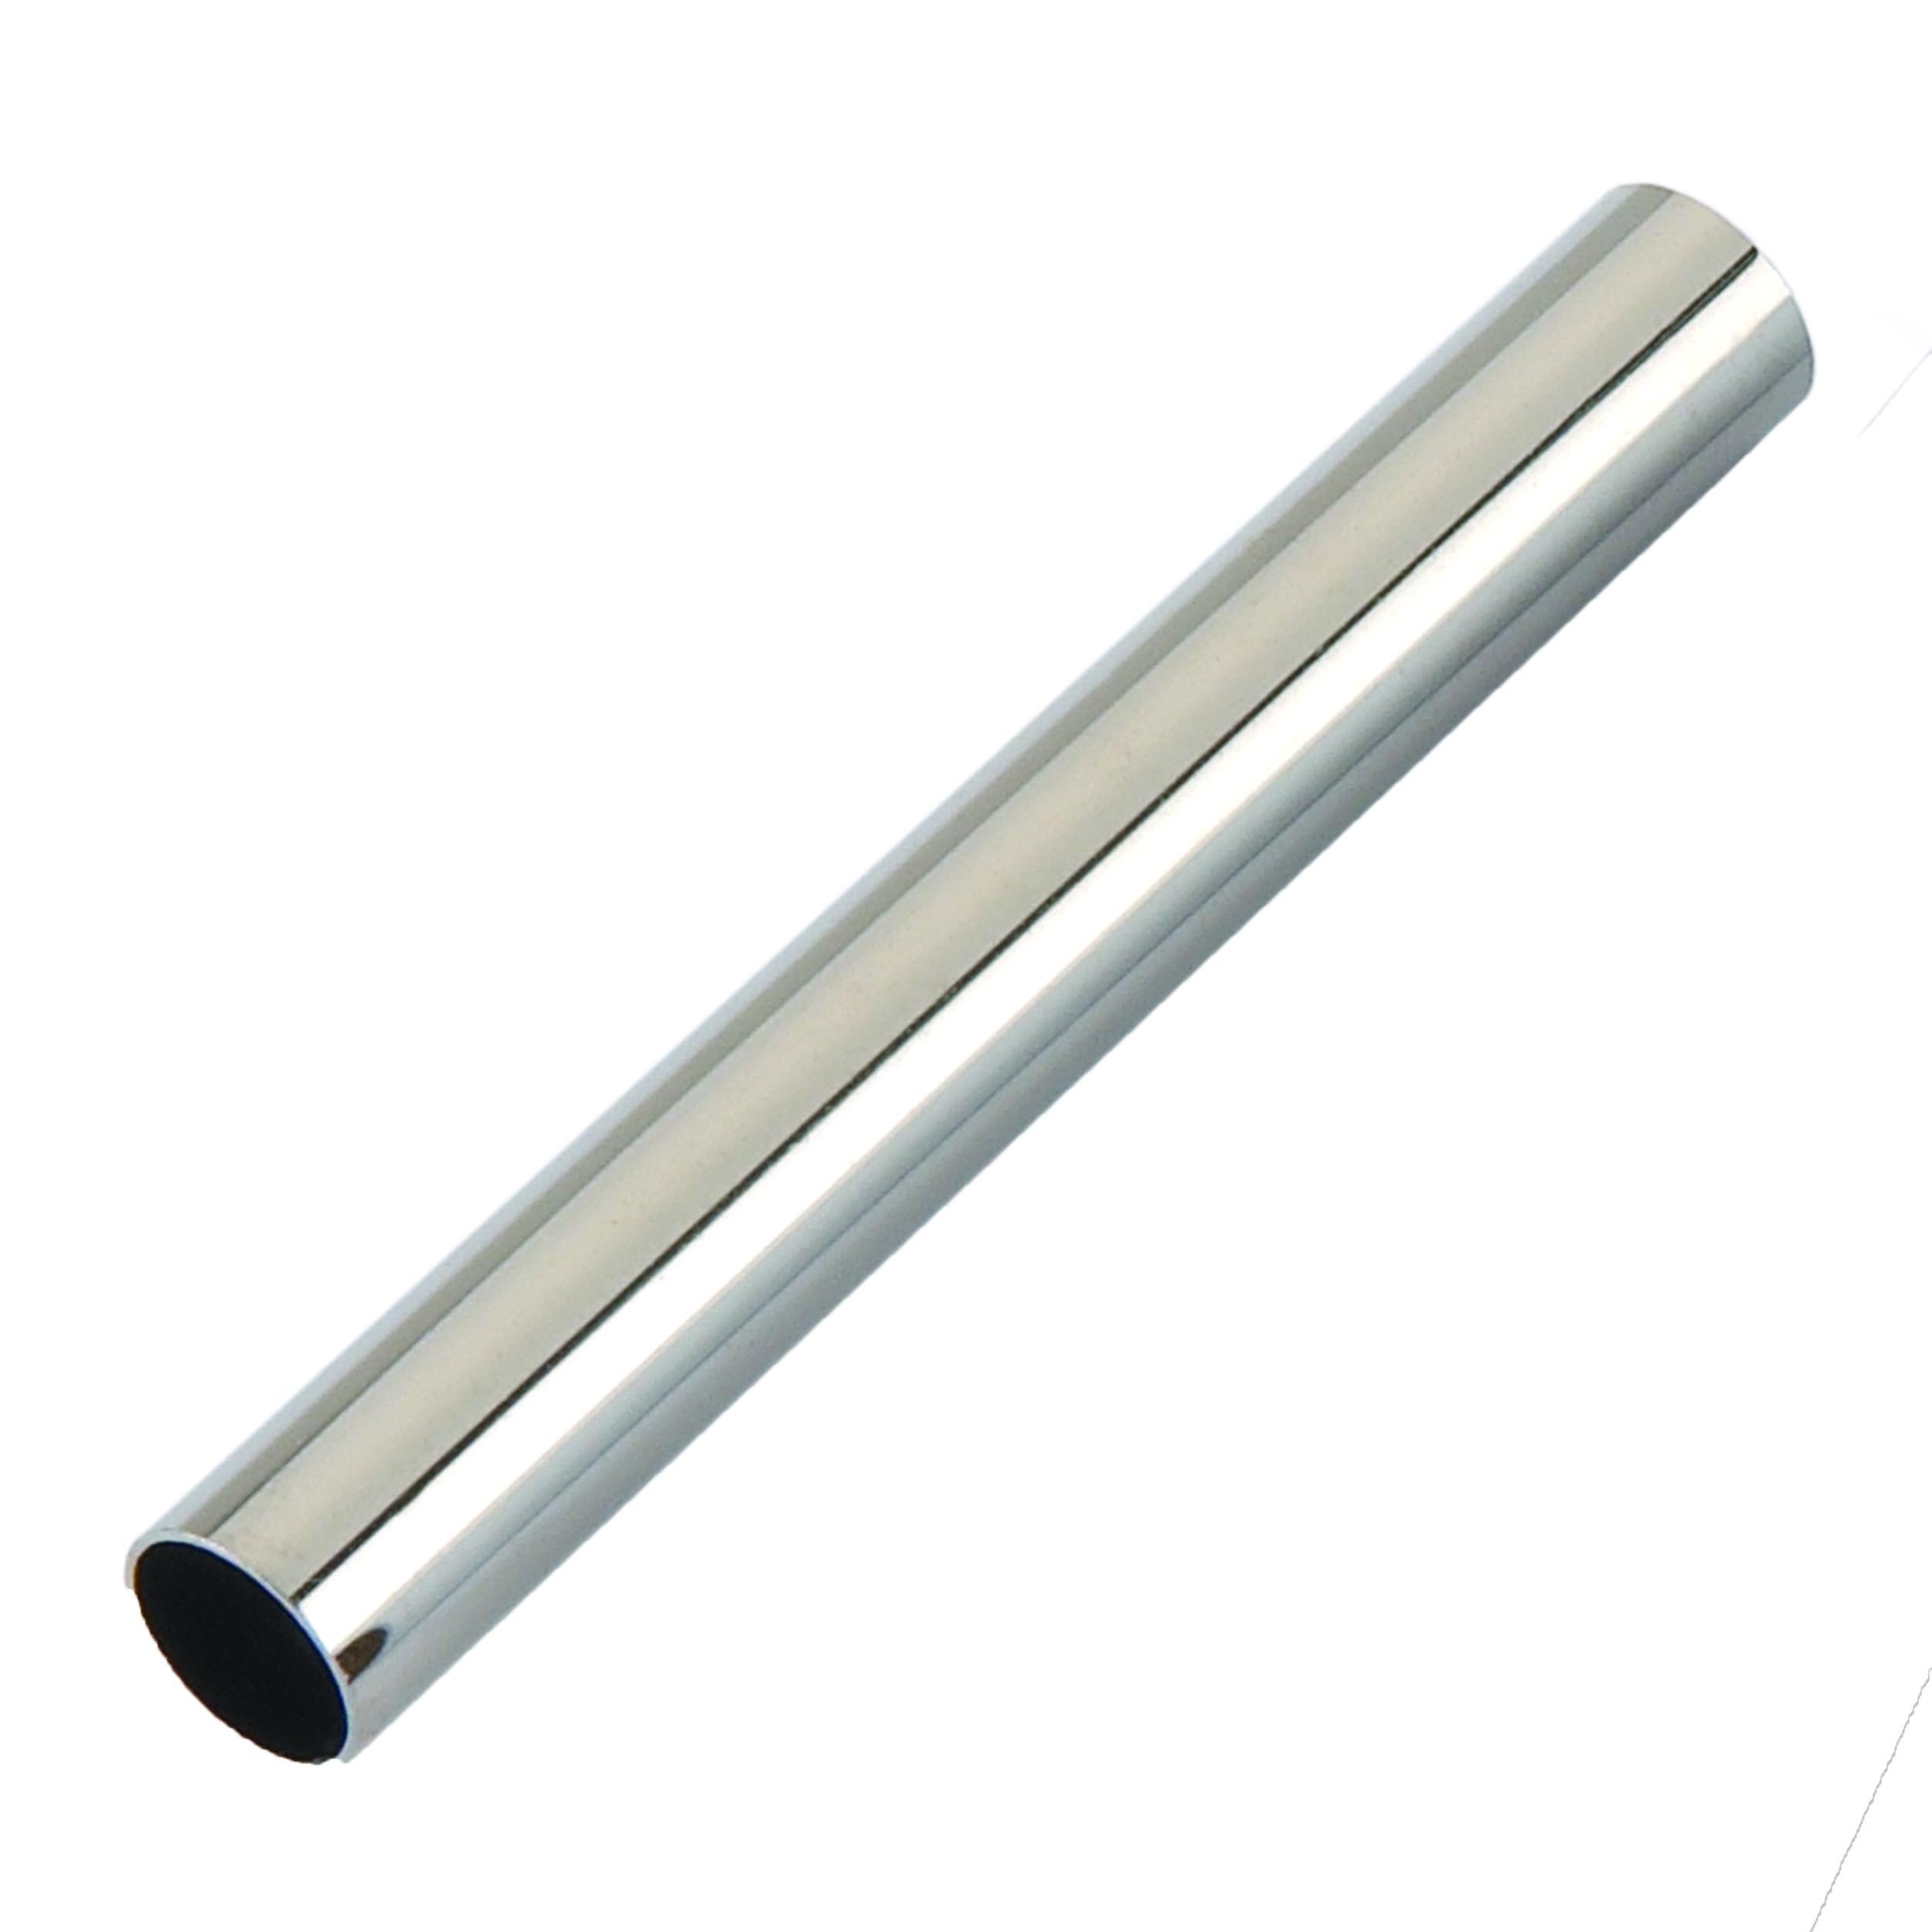 Euro Style Pen Bright Nickel Tubes 5 -Pair